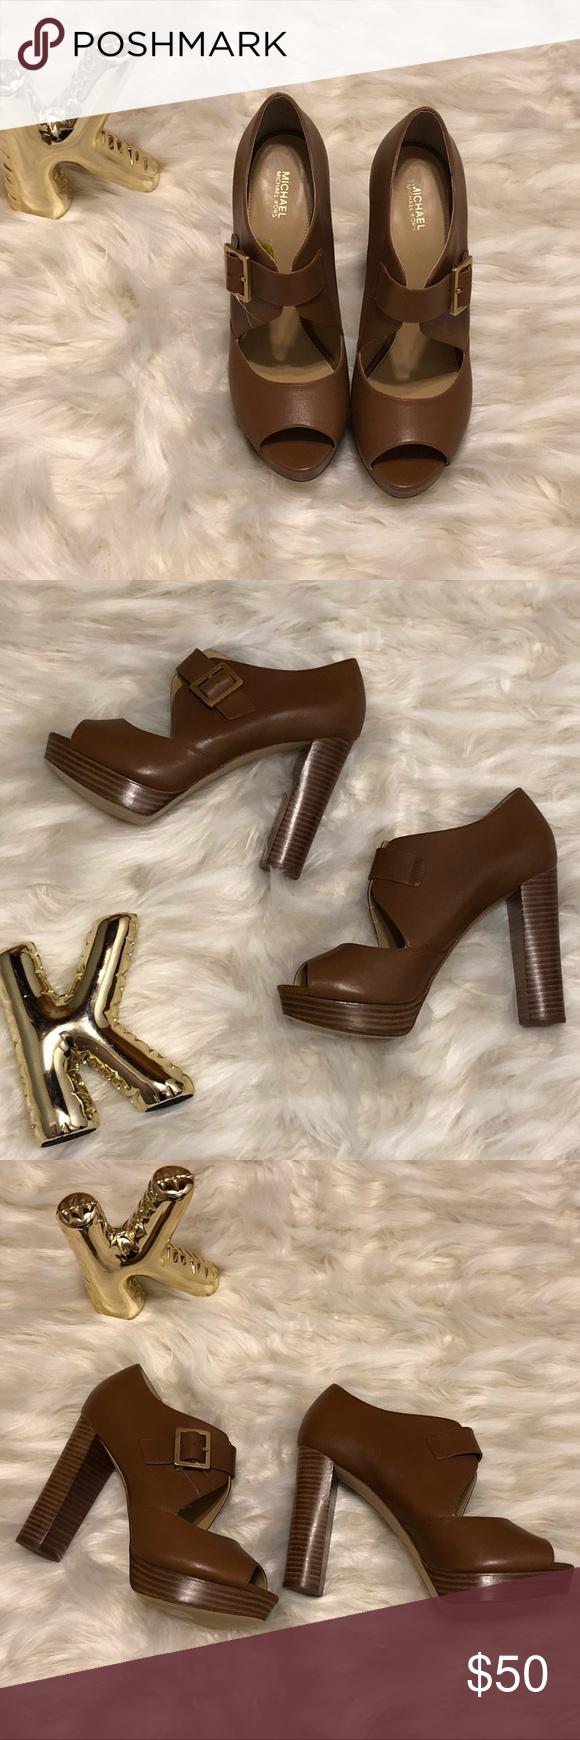 8c83430f445 Spotted while shopping on Poshmark  NWOT Michael Kors platform heels!   poshmark  fashion  shopping  style  MICHAEL Michael Kors  Shoes